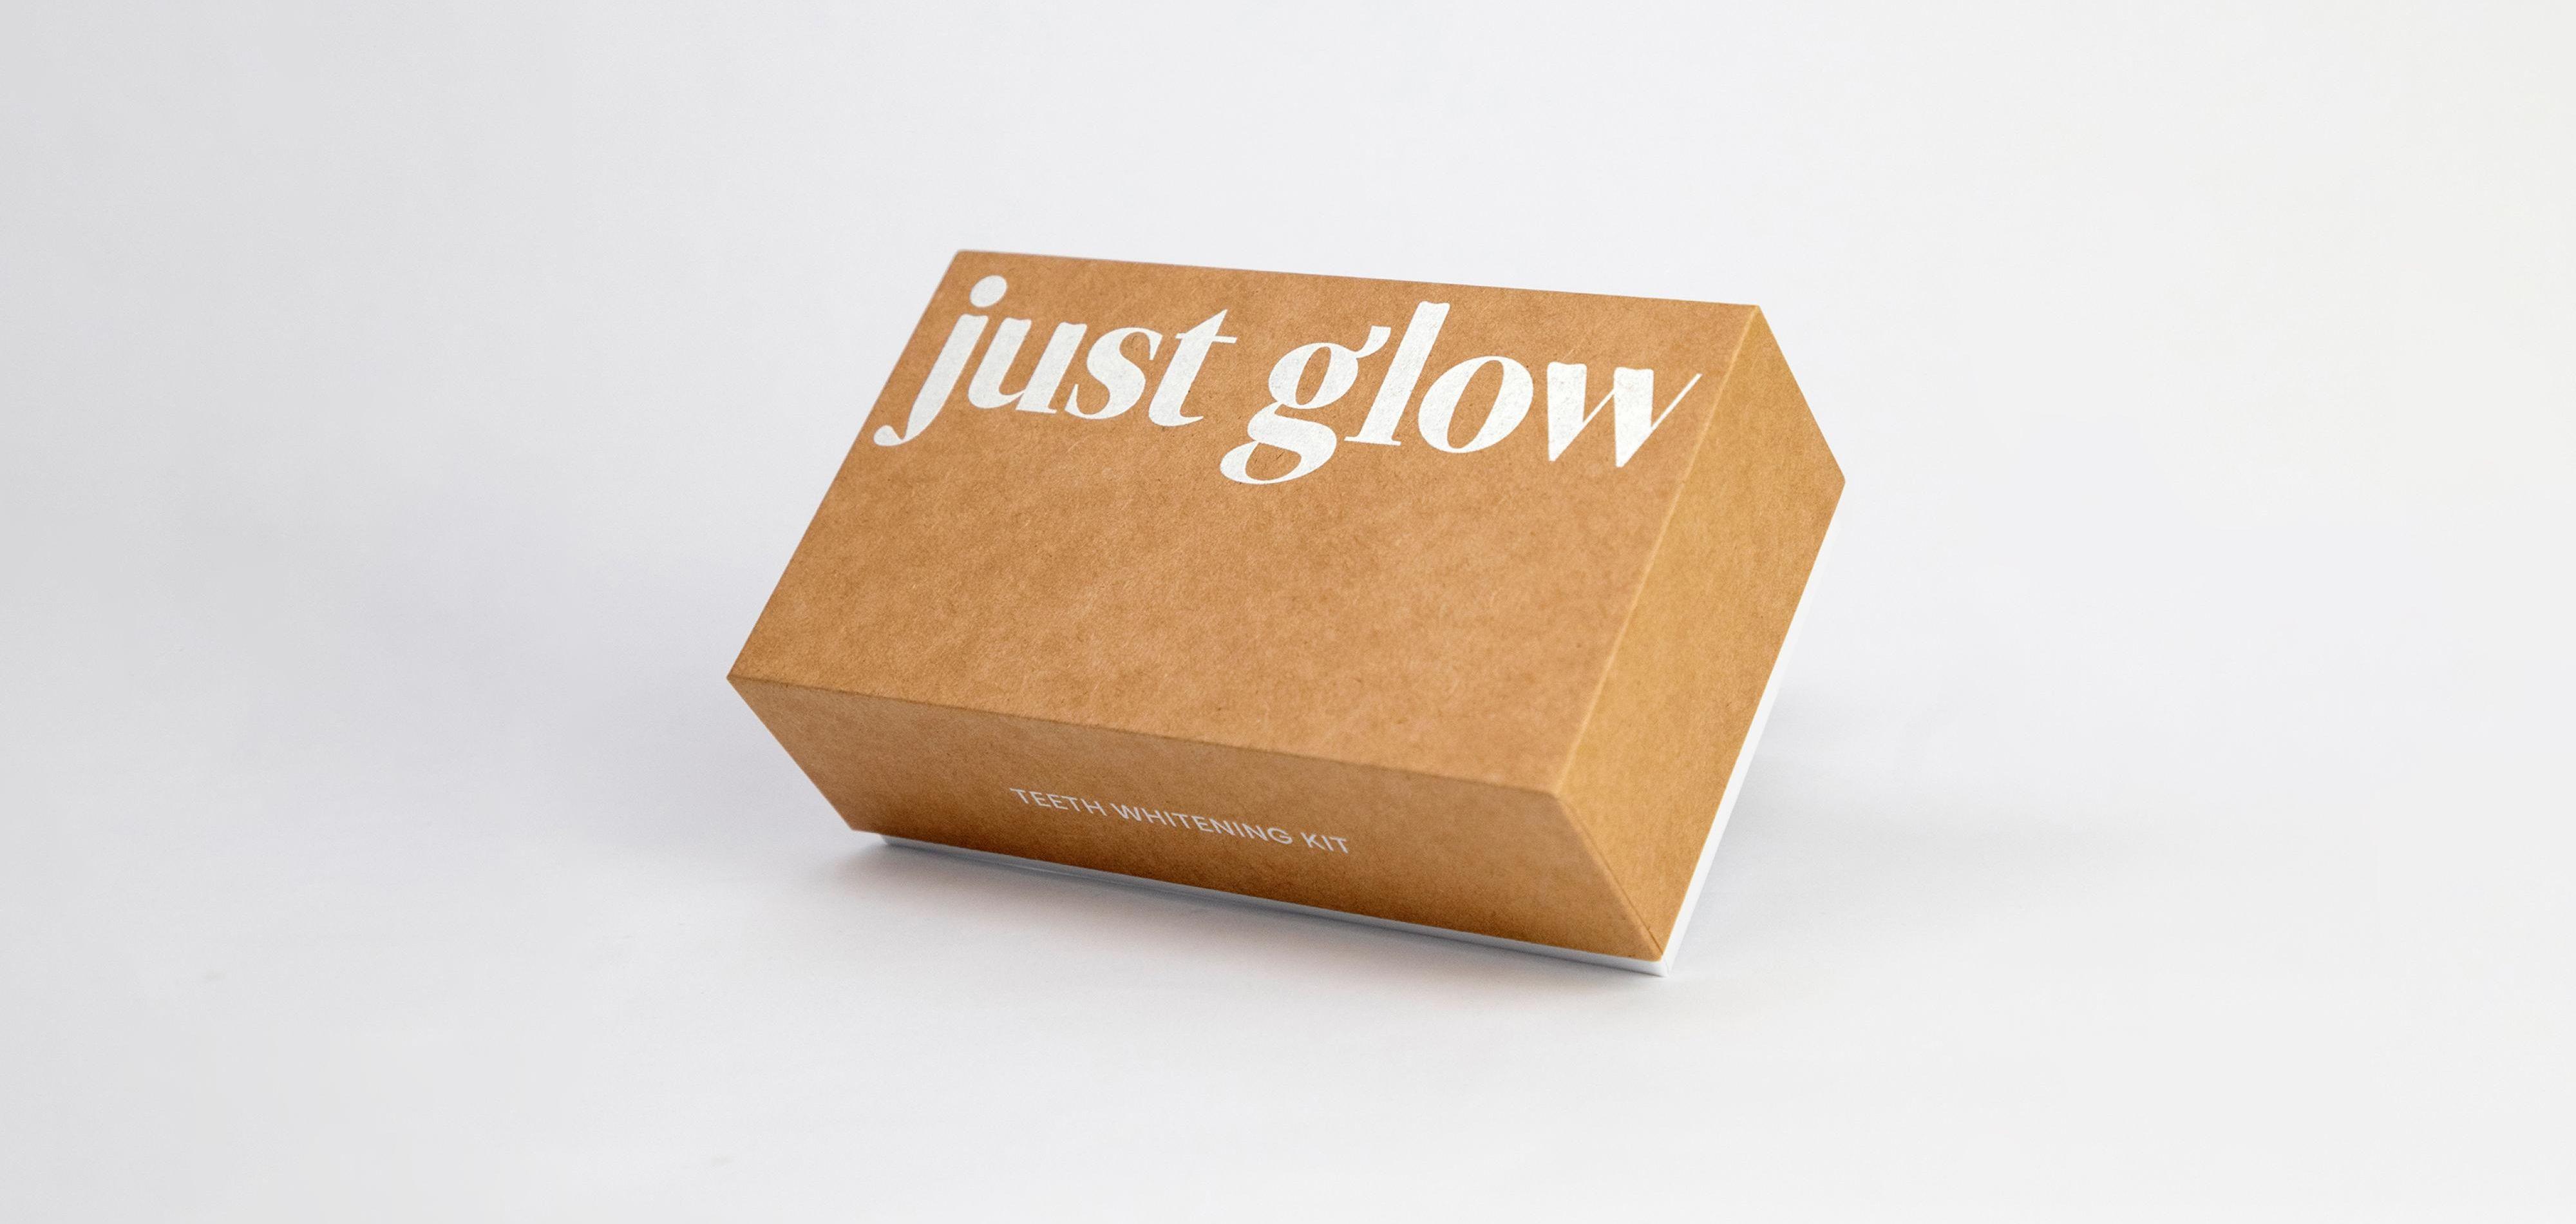 Just Glow Teeth Whitening Box